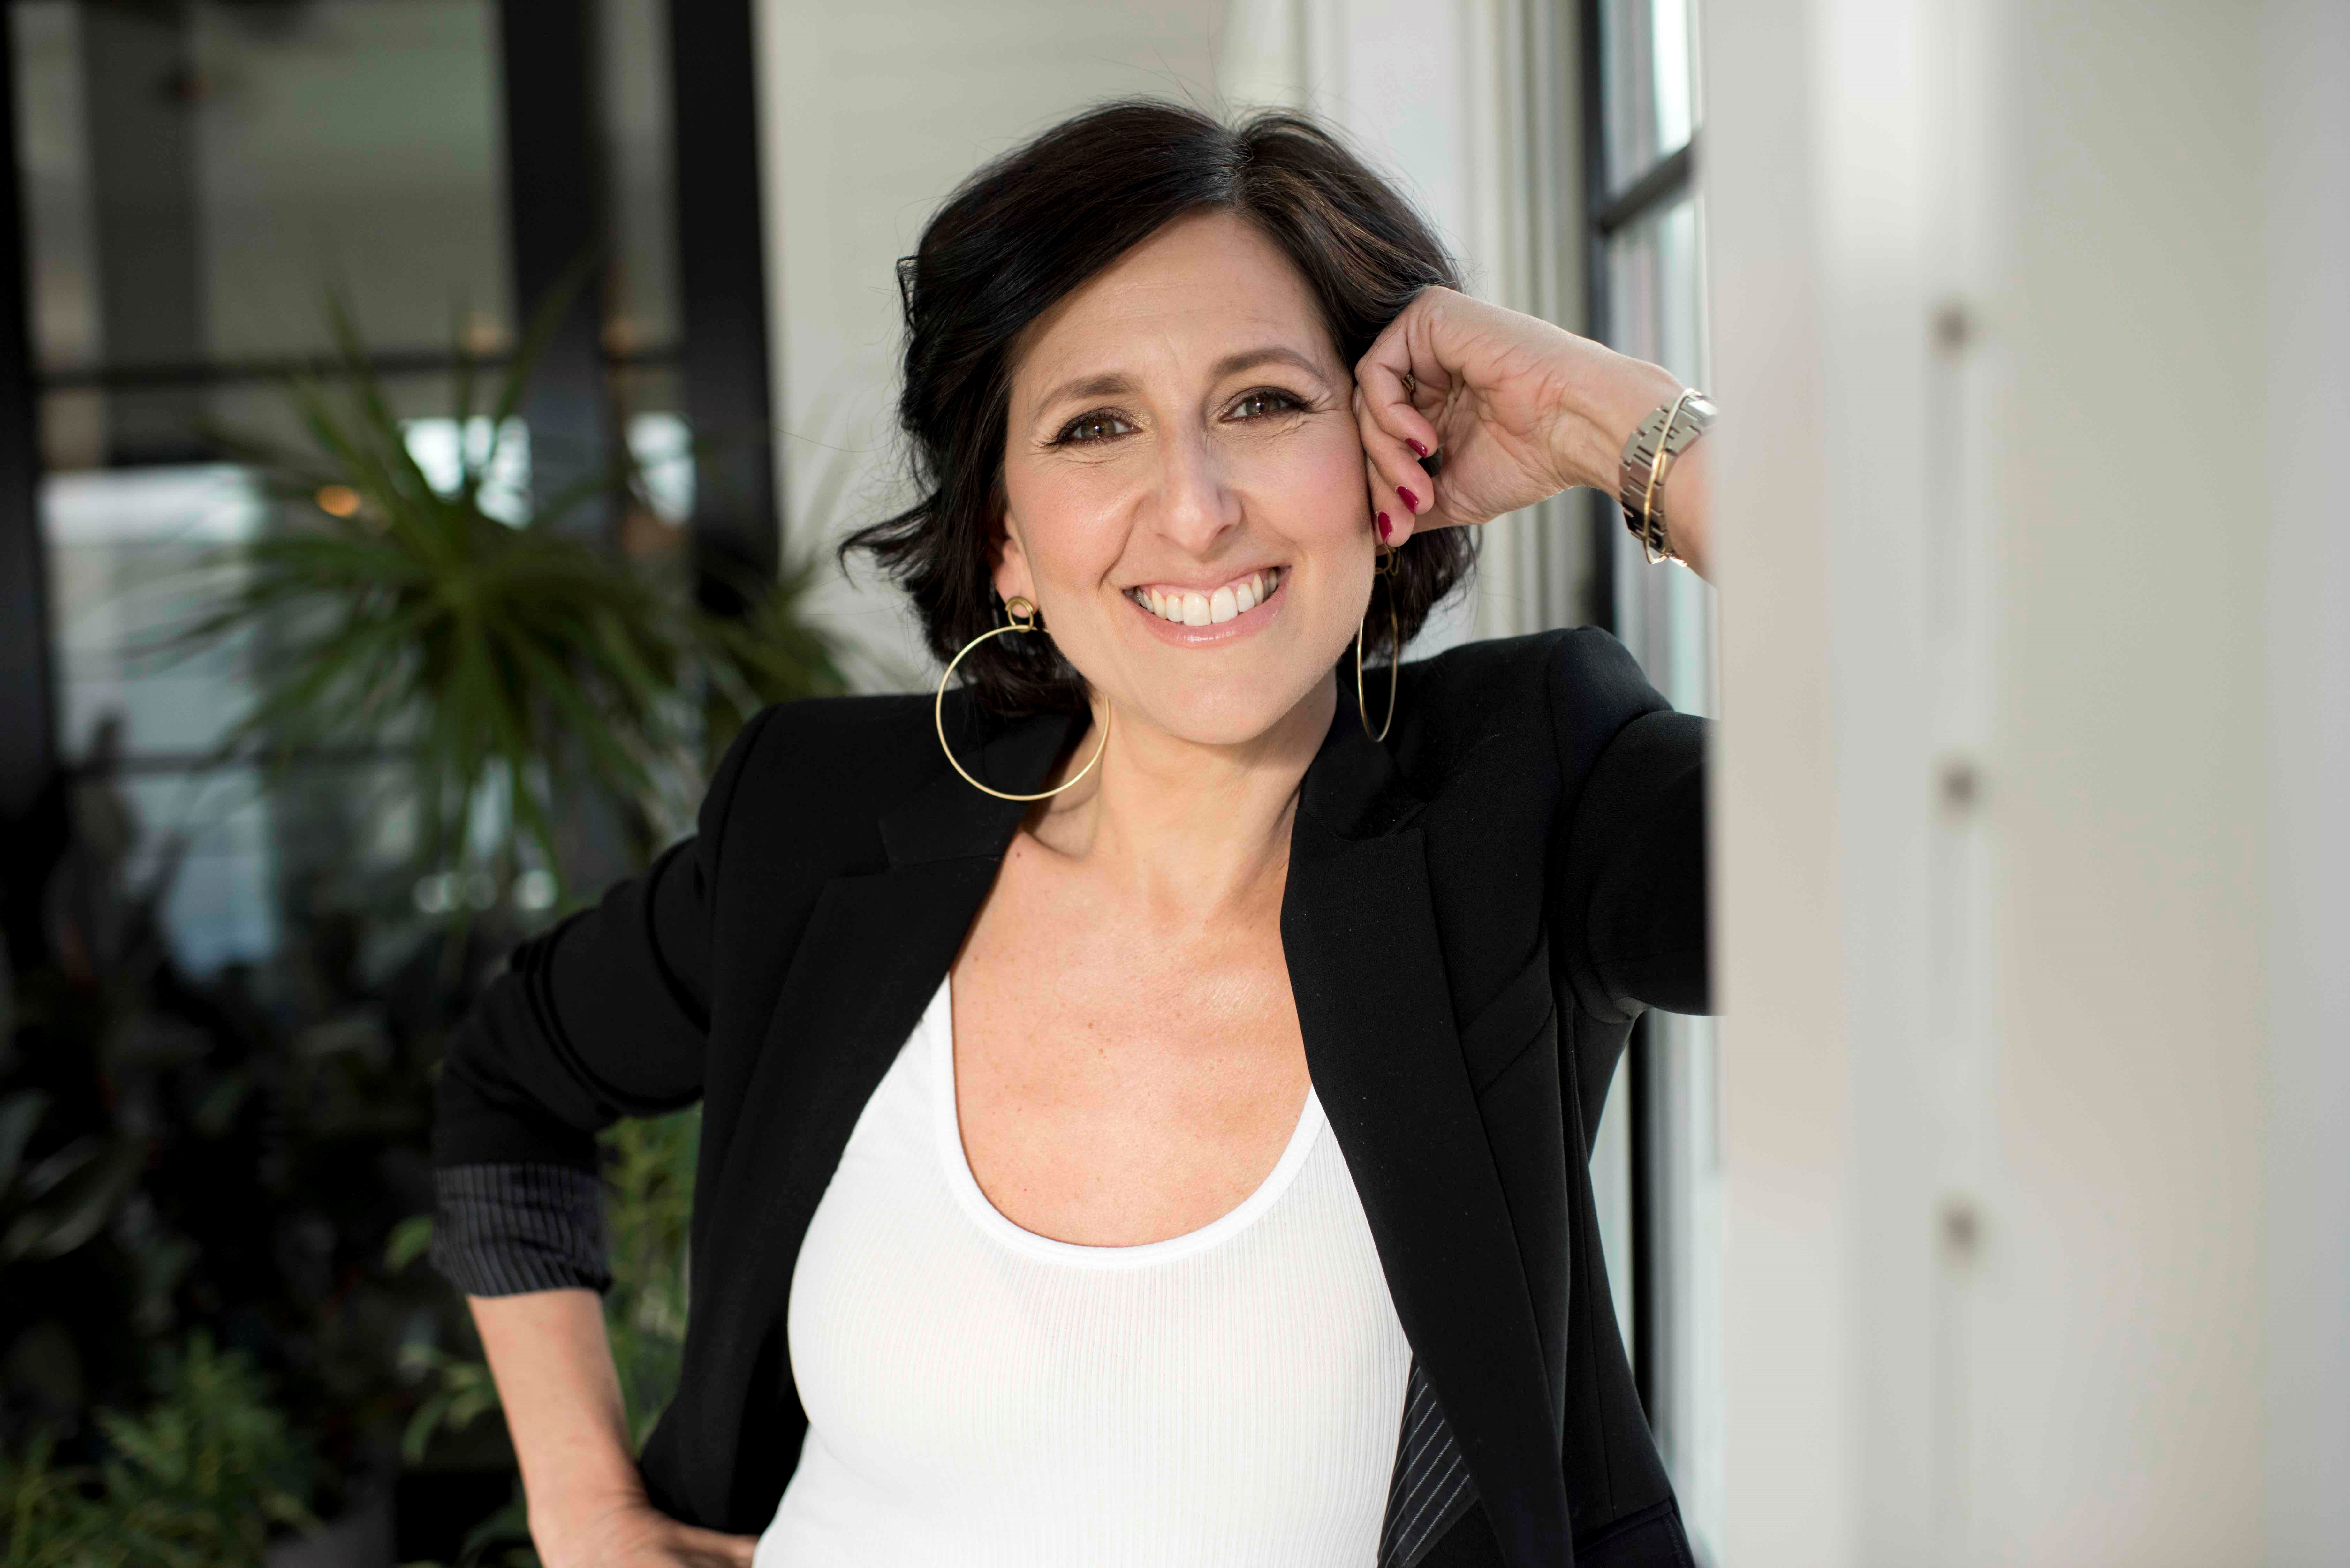 Dr Aviva Romm (Wendy Yalom/PA)